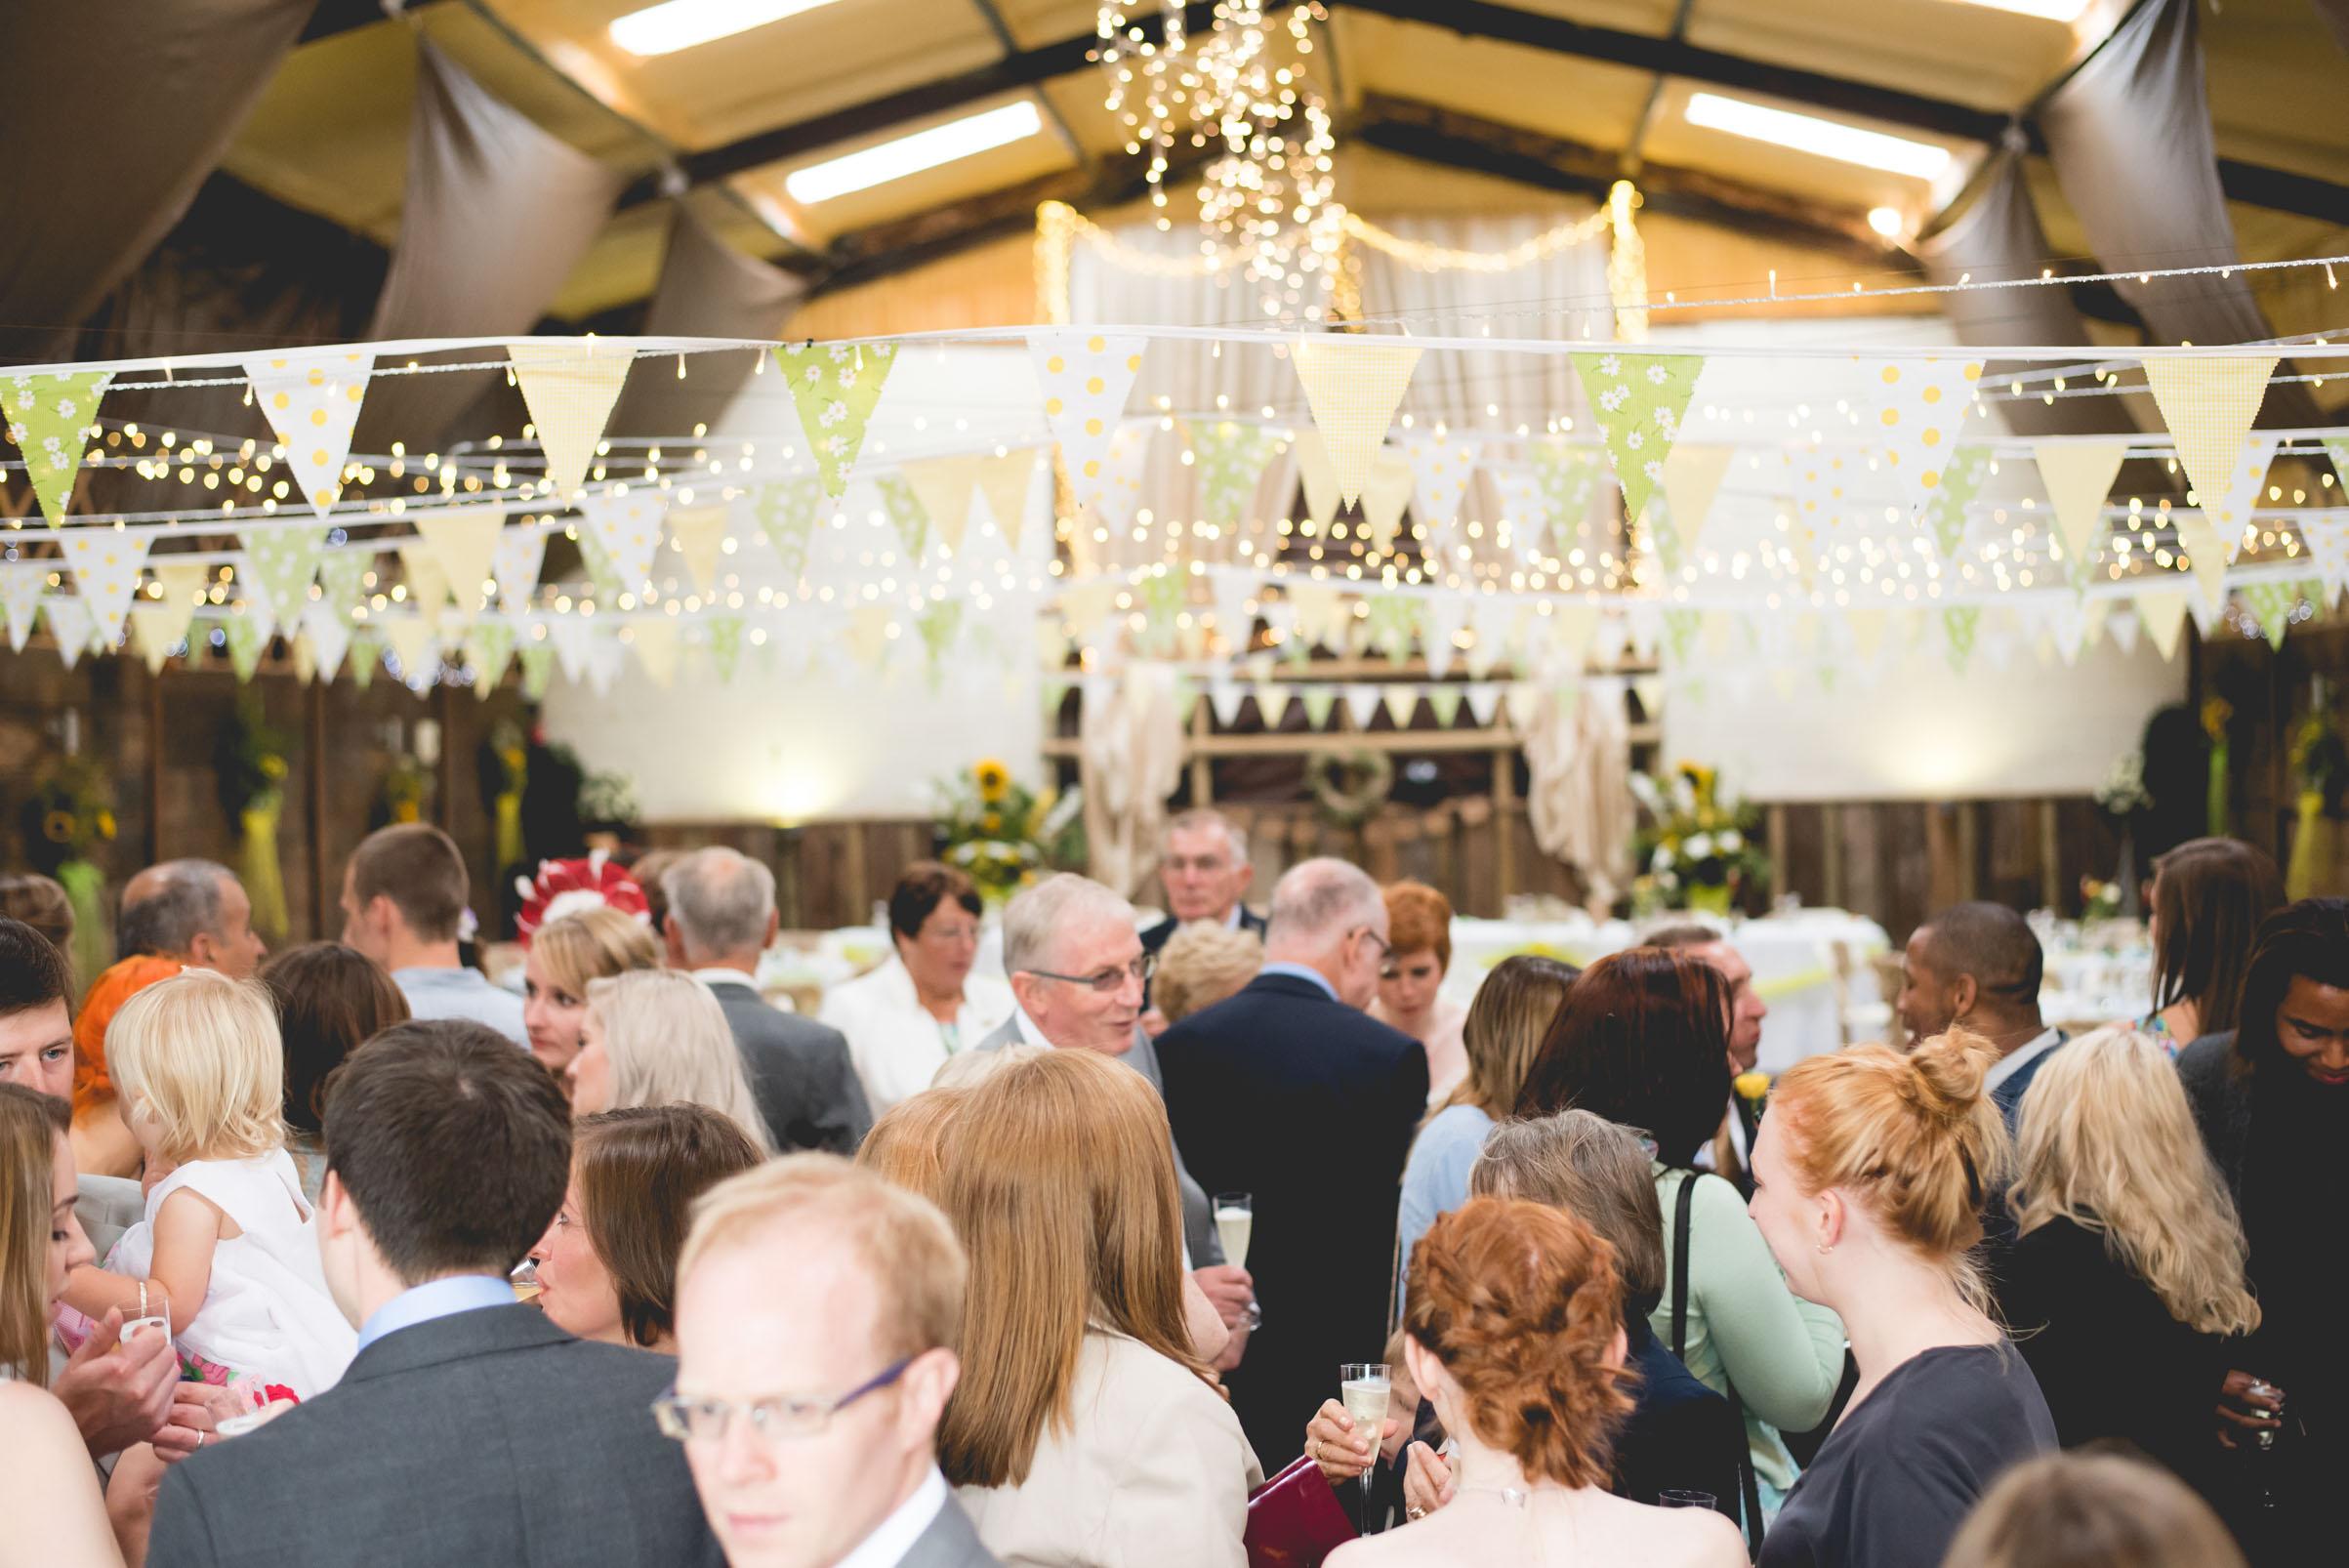 Peak+district+farm+wedding+lower+damgate+photographer-144.jpg